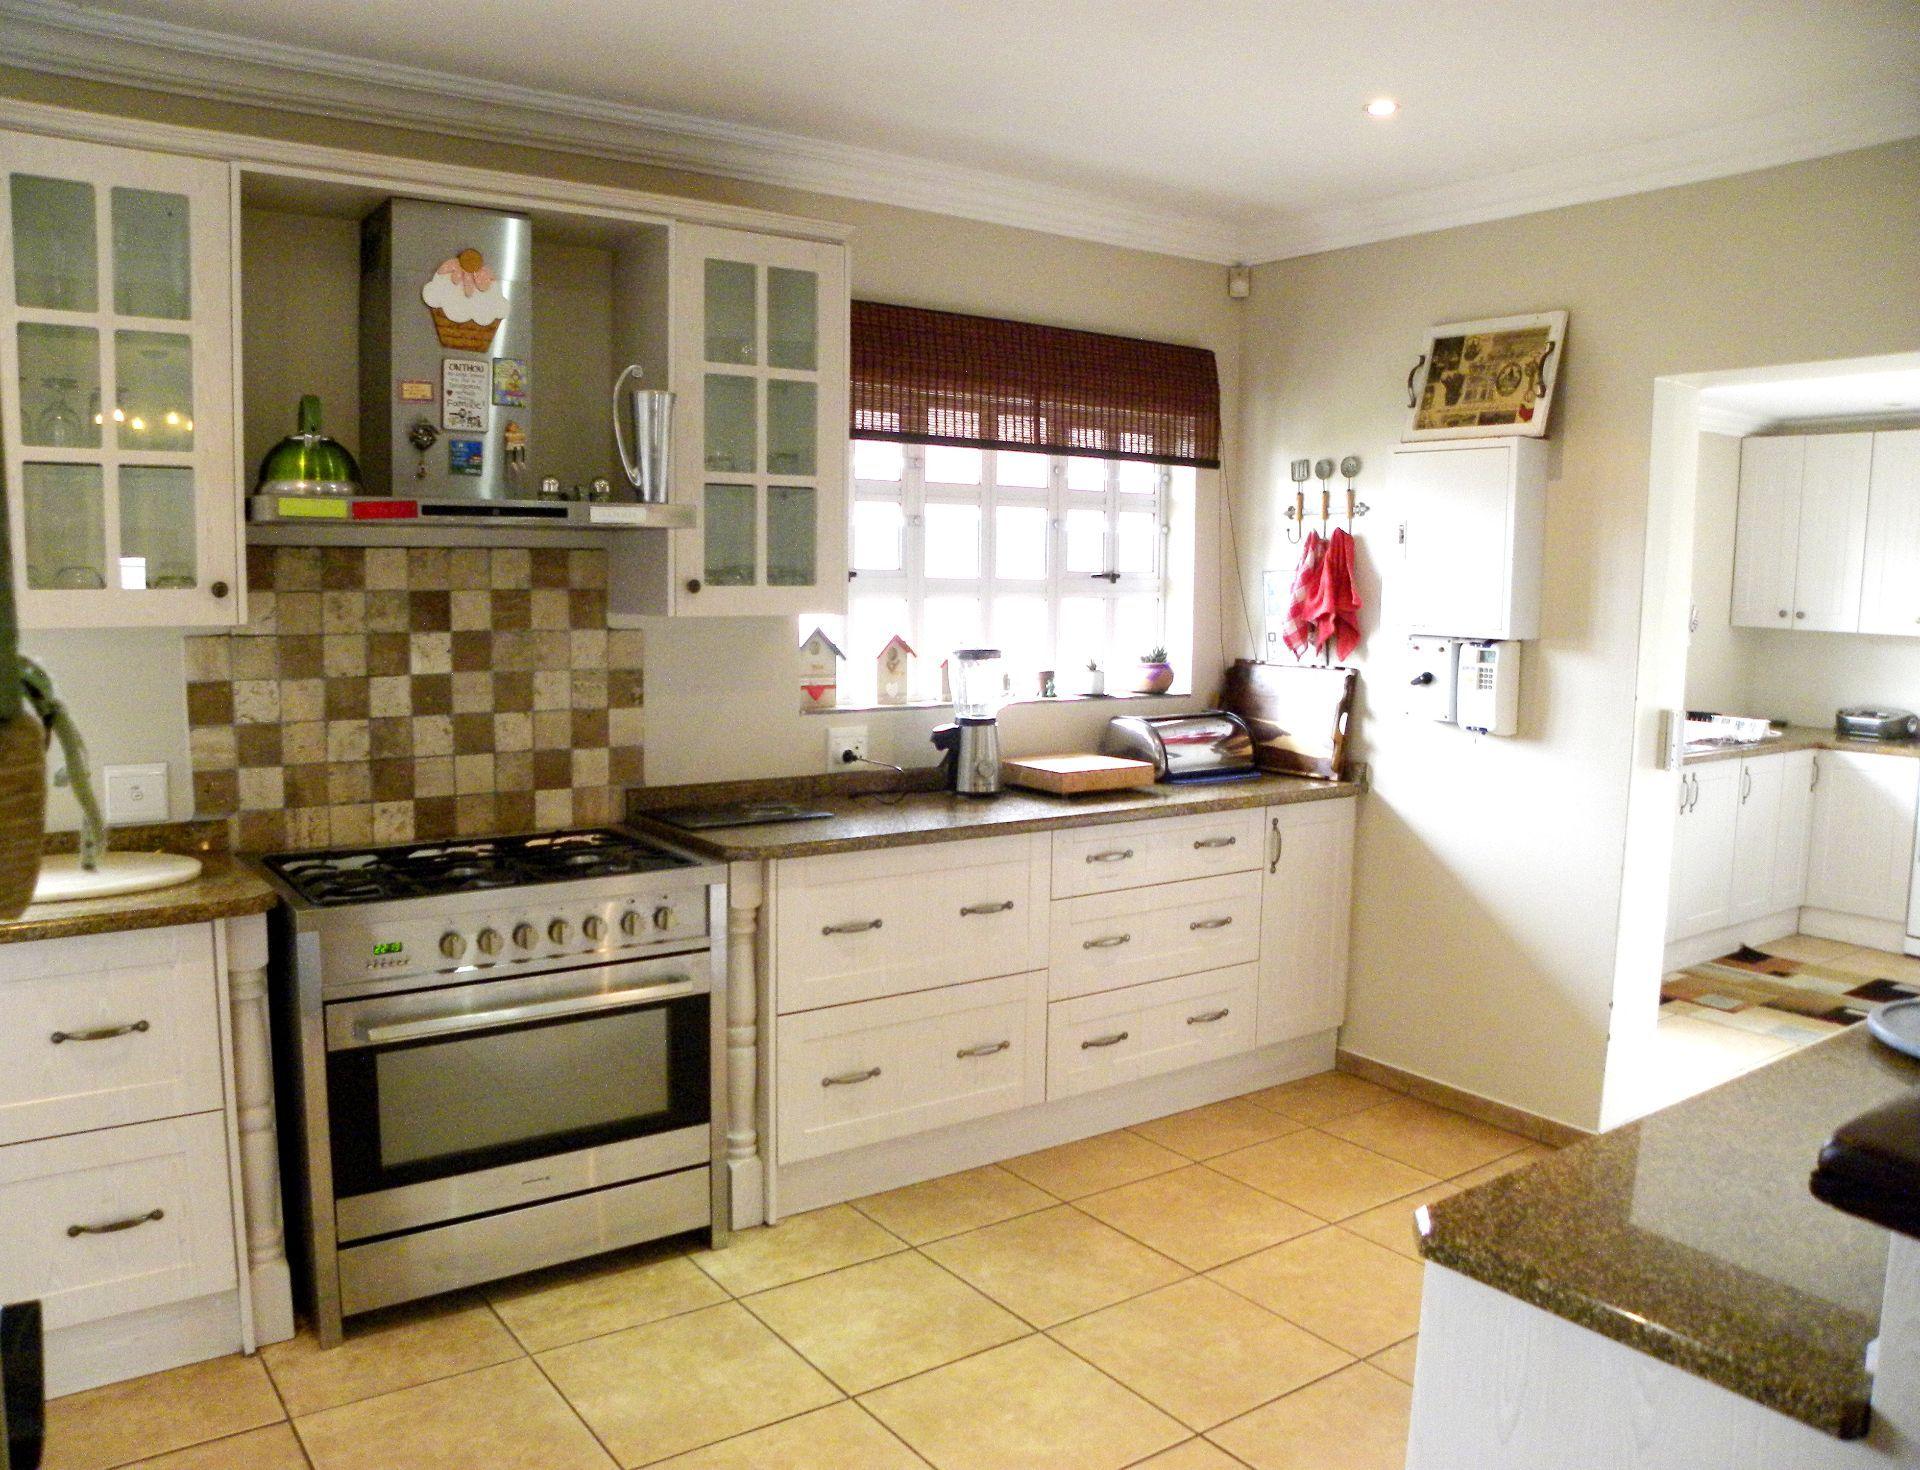 Bonnie Doone property for sale. Ref No: 13553551. Picture no 7